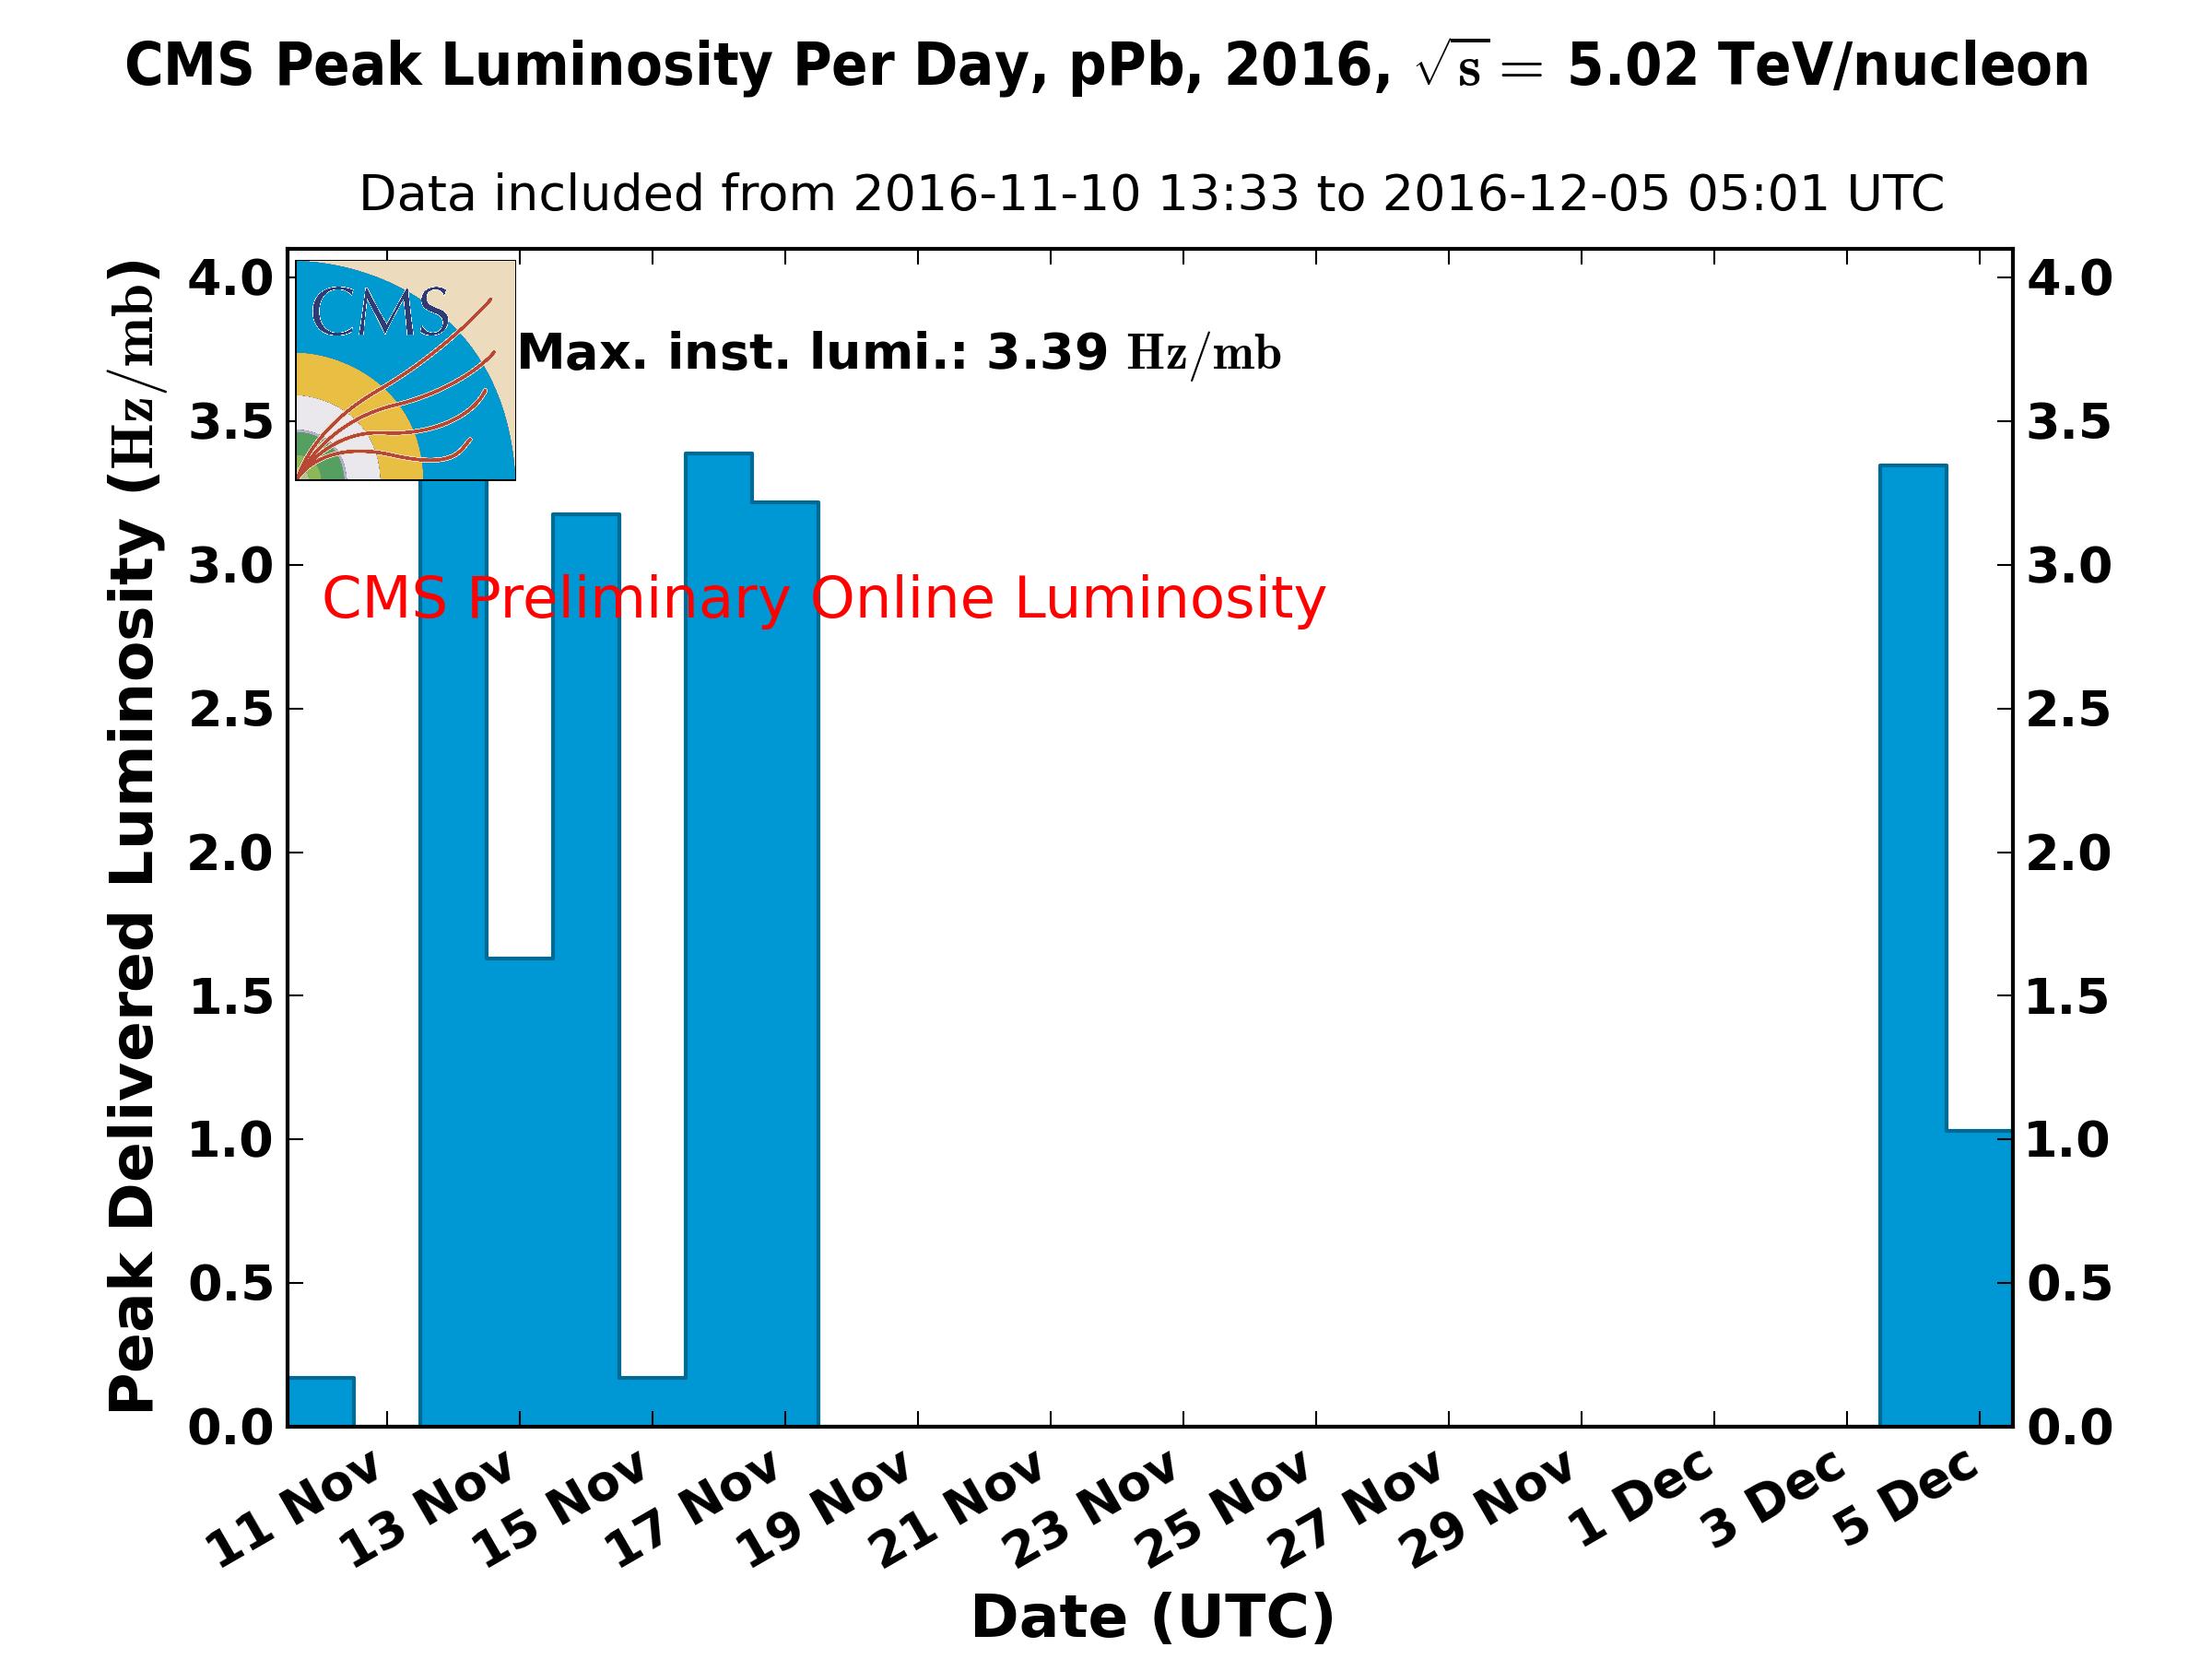 https://cern.ch/cmslumi/publicplots/peak_lumi_per_day_ppb_2016OnlineLumi5TeVPPb.png